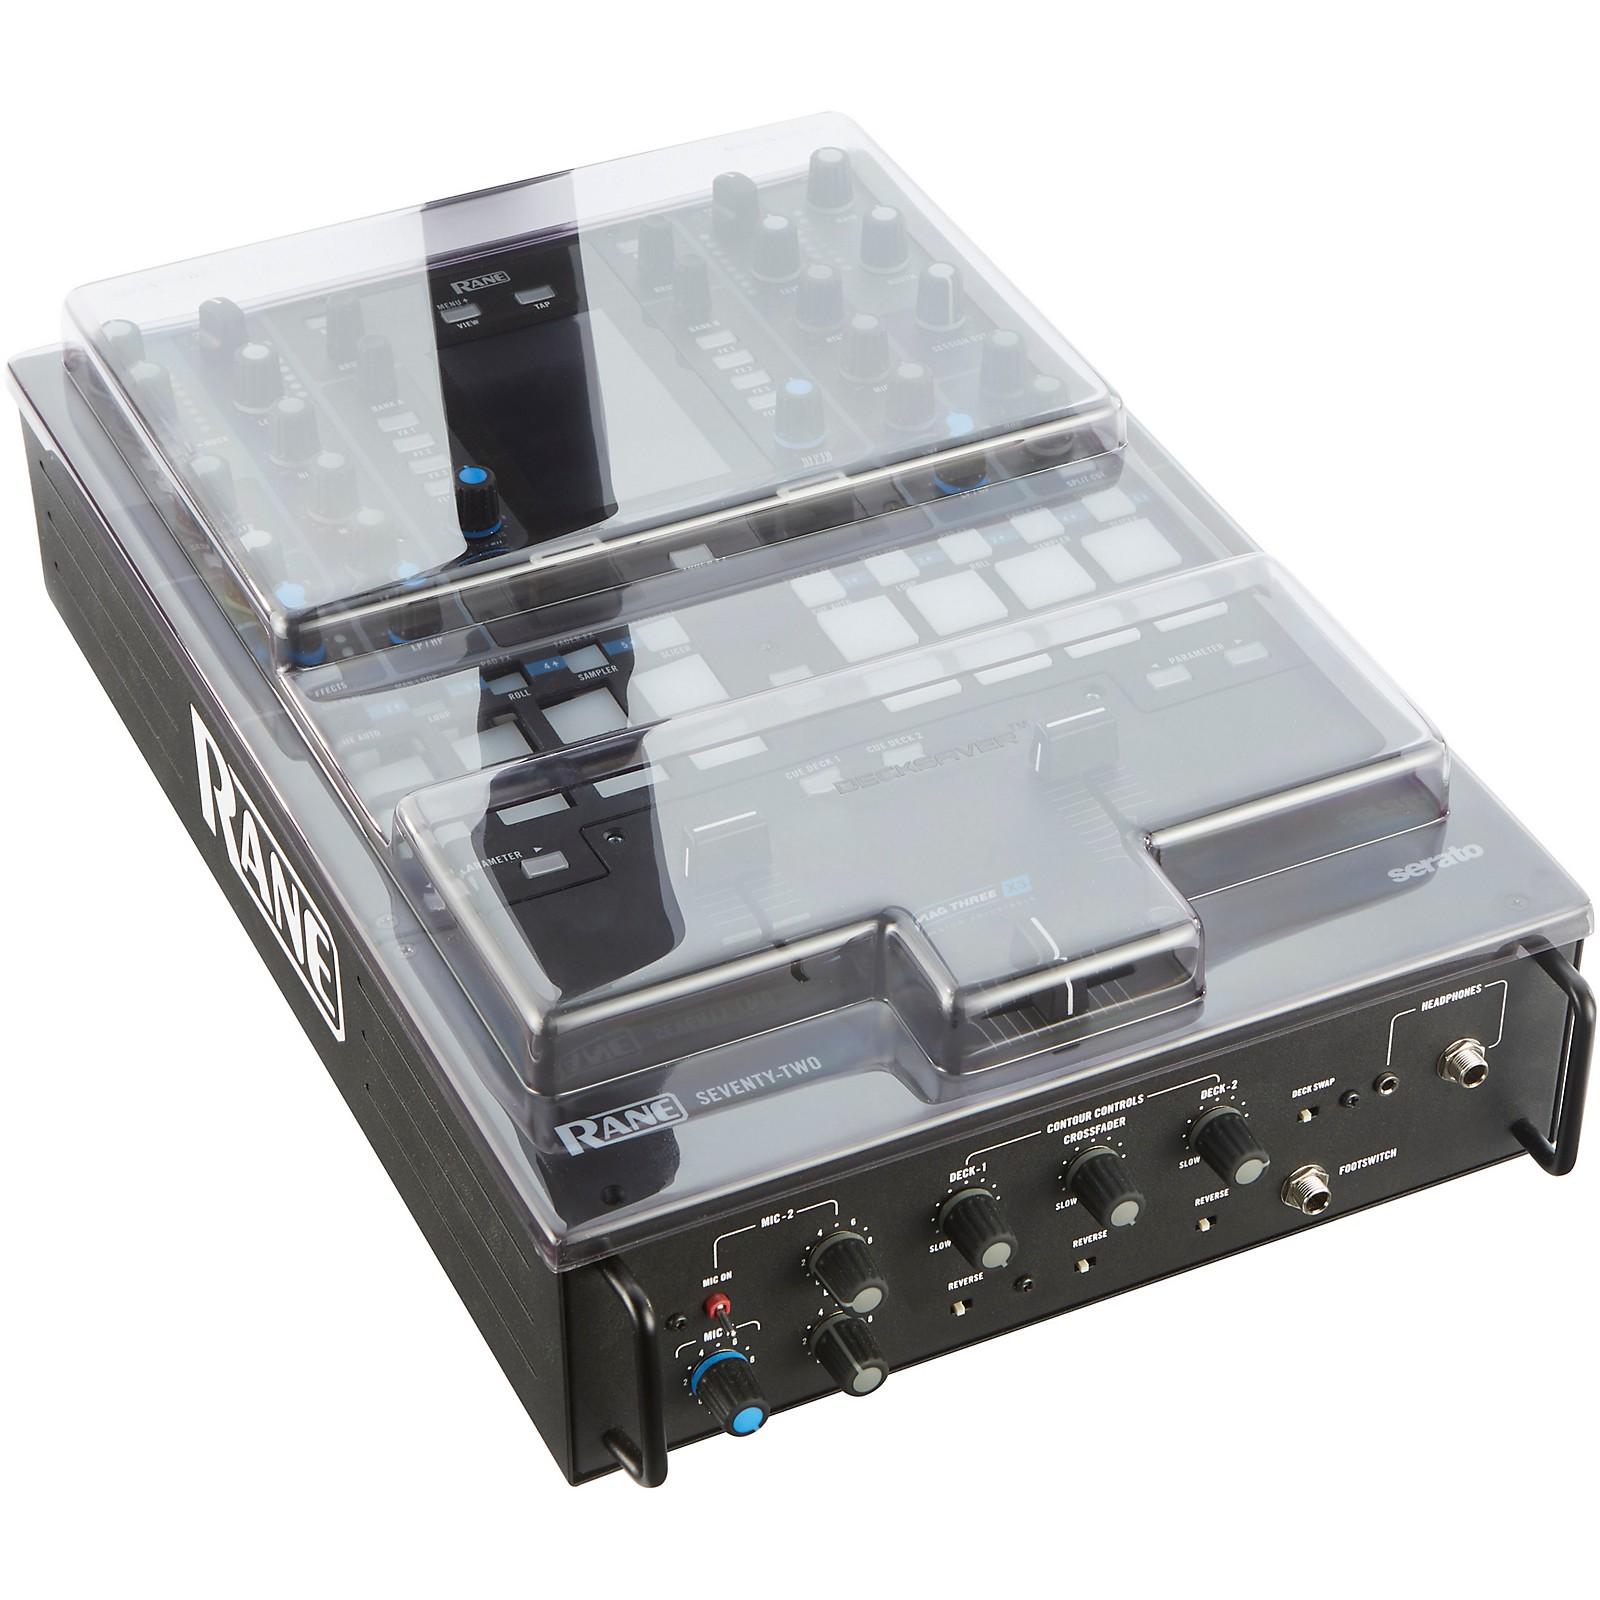 Decksaver Cover for Rane Seventy-Two Battle DJ Mixer